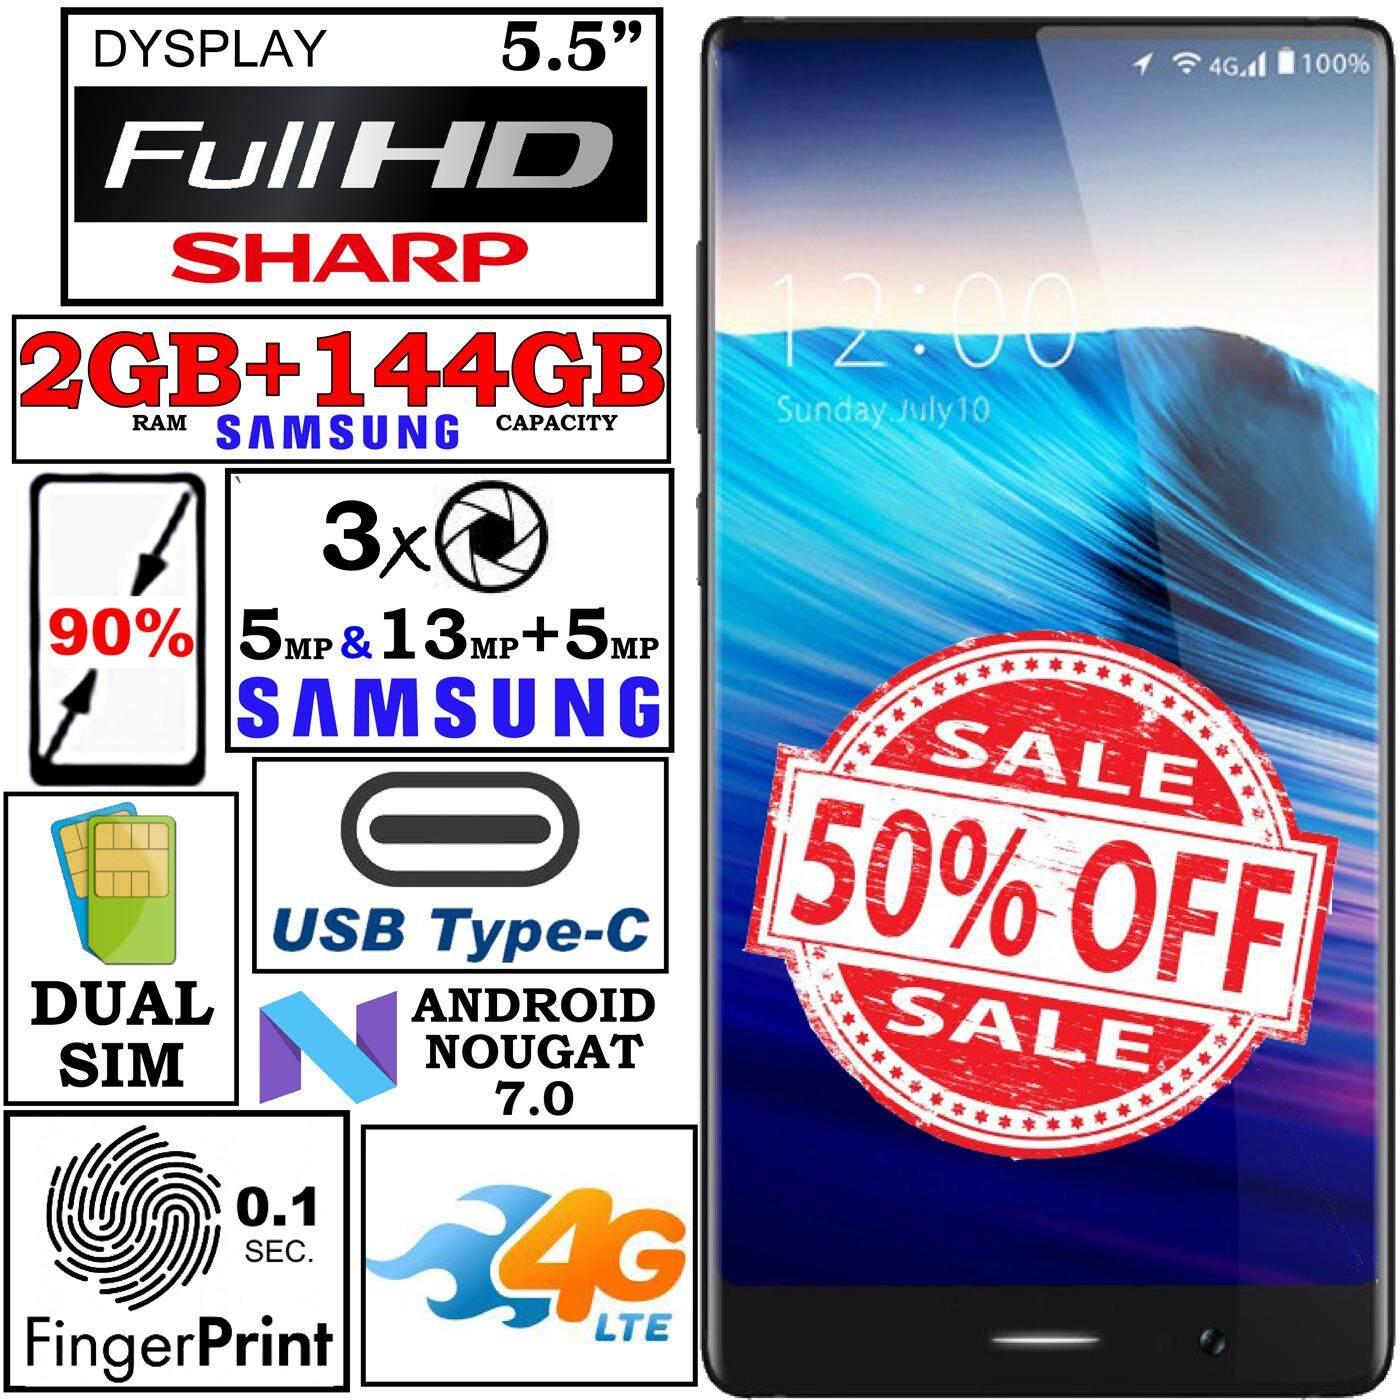 Umidigi Crystal 272Gb 144Gb 2Gb 13Mp 5Mp 5Mp Sony กล้อง ลายนิ้วมือ 4G Lte หน้าจอ Fhd Ips Sharp สีดำ Samsung หน่วยความจำแฟลช Usb Type C Mi Mix 2 เป็นต้นฉบับ